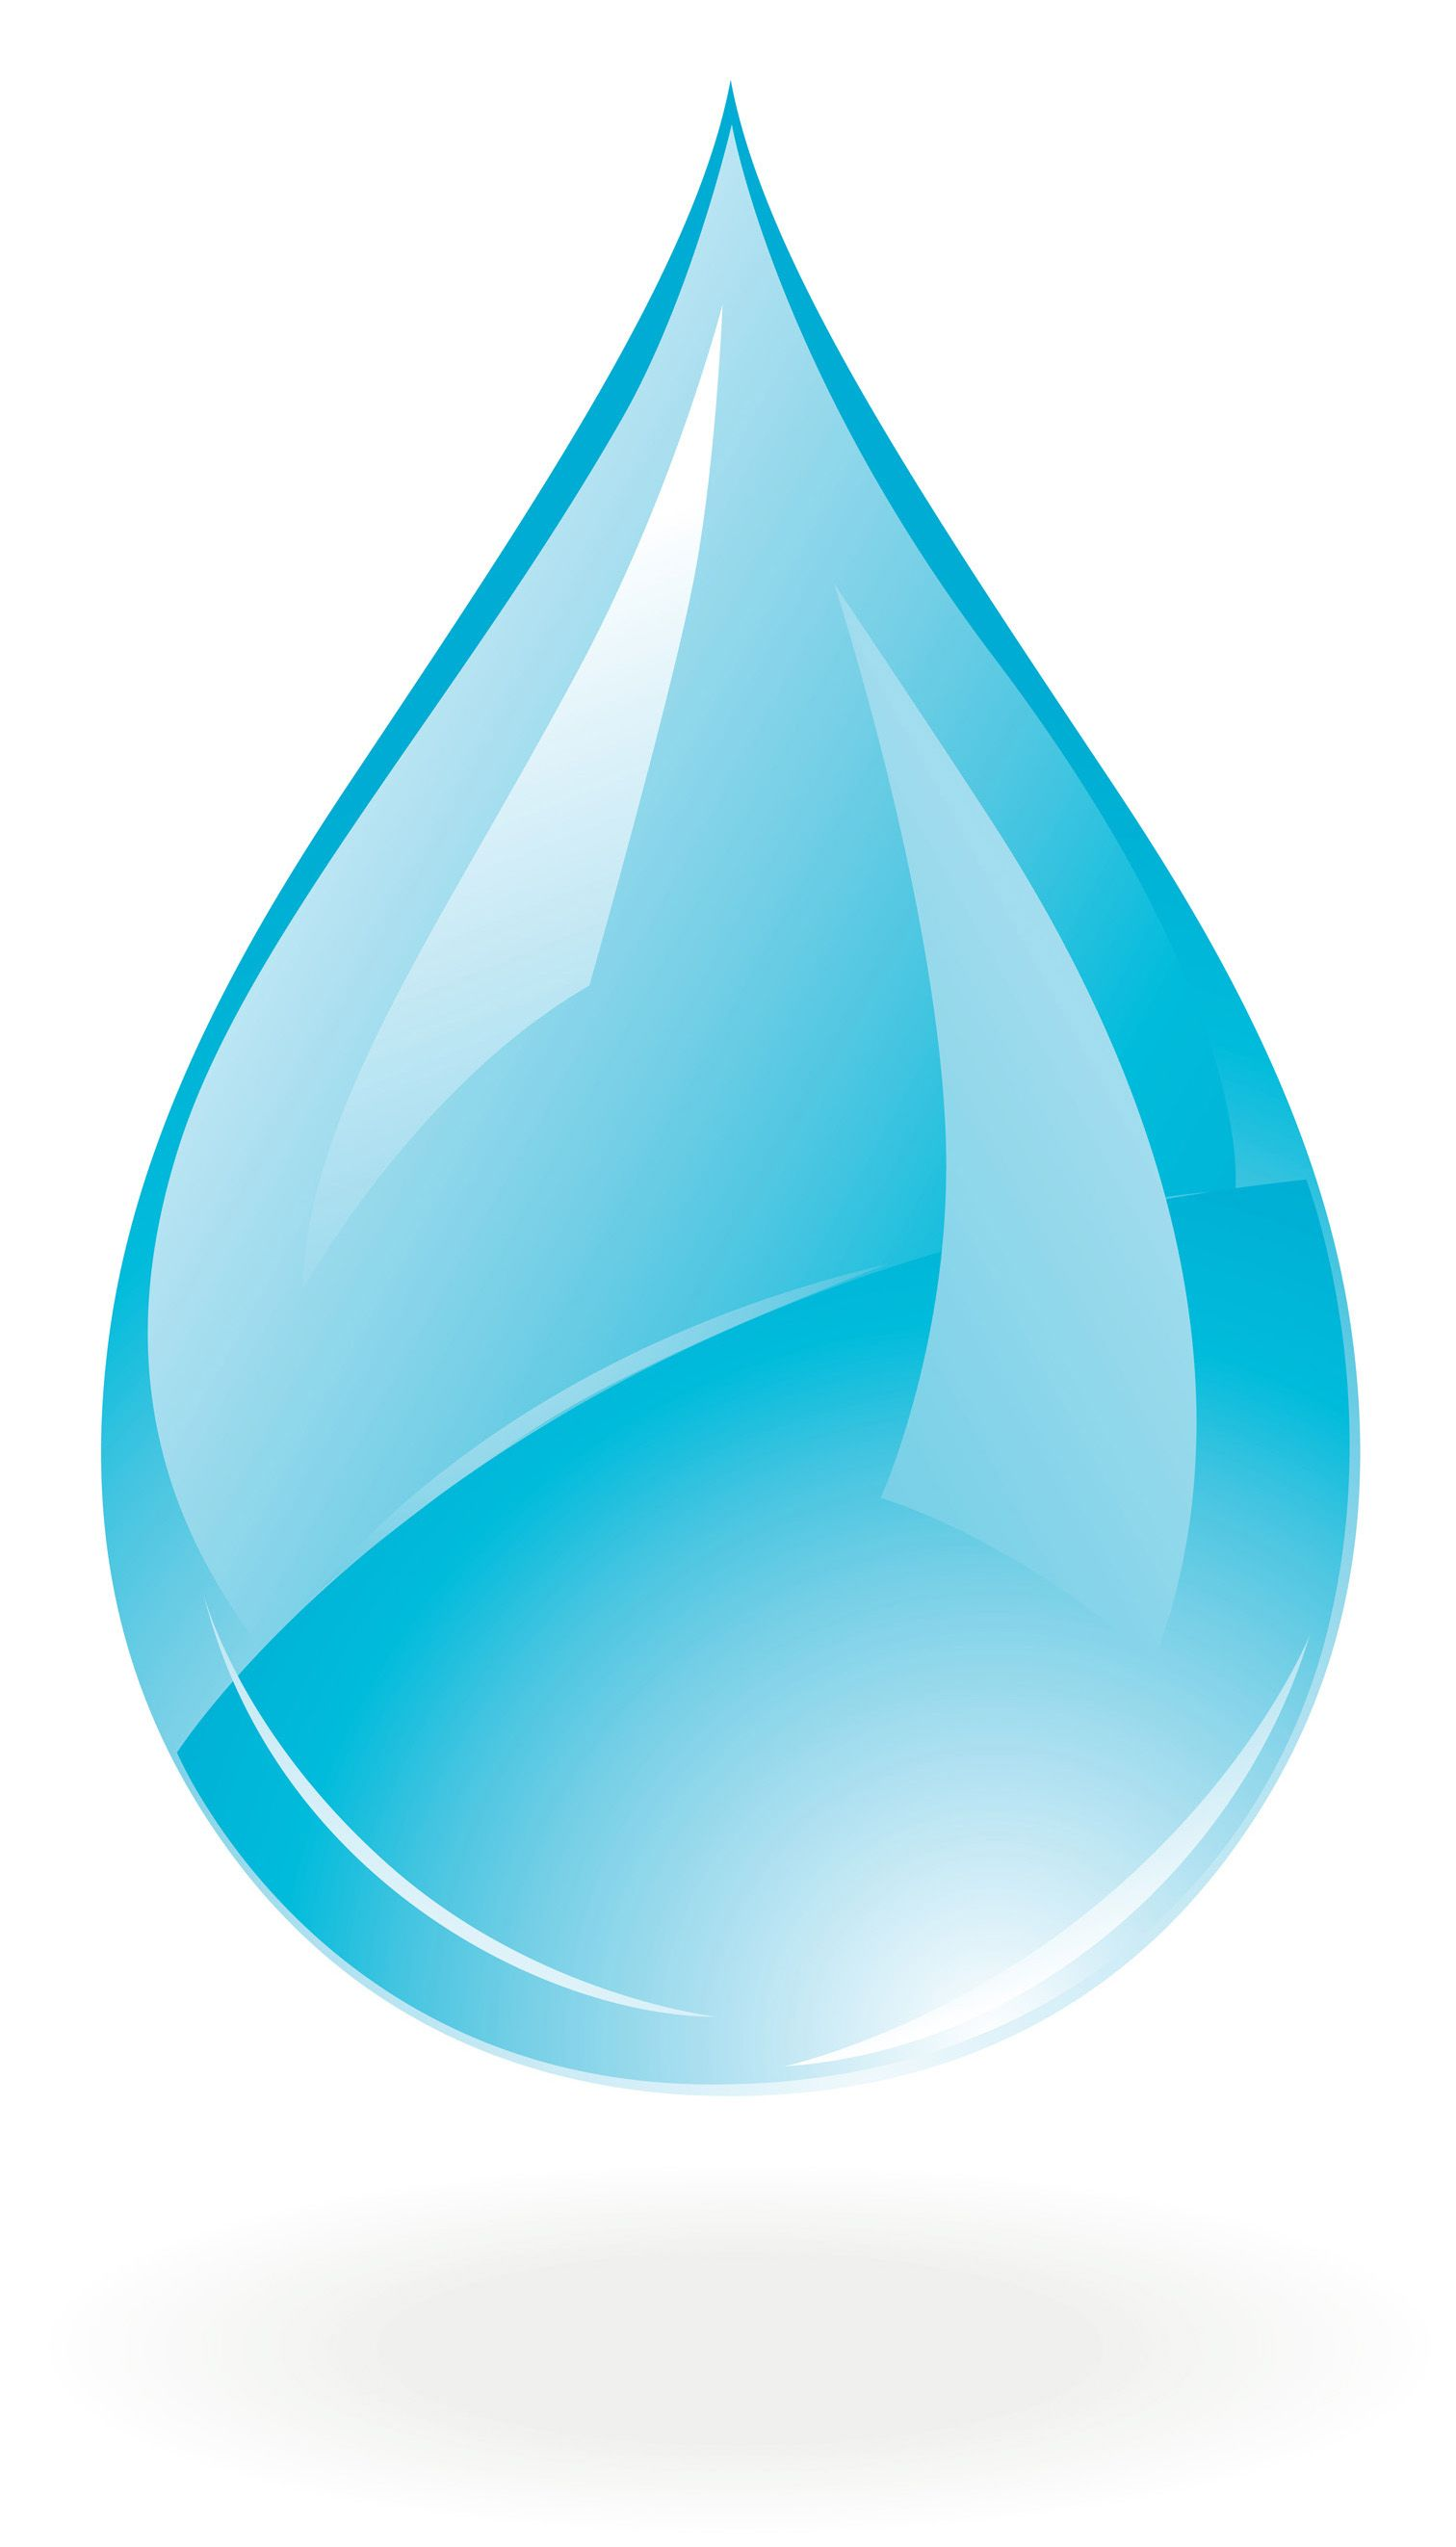 medium resolution of water drop psd clipart